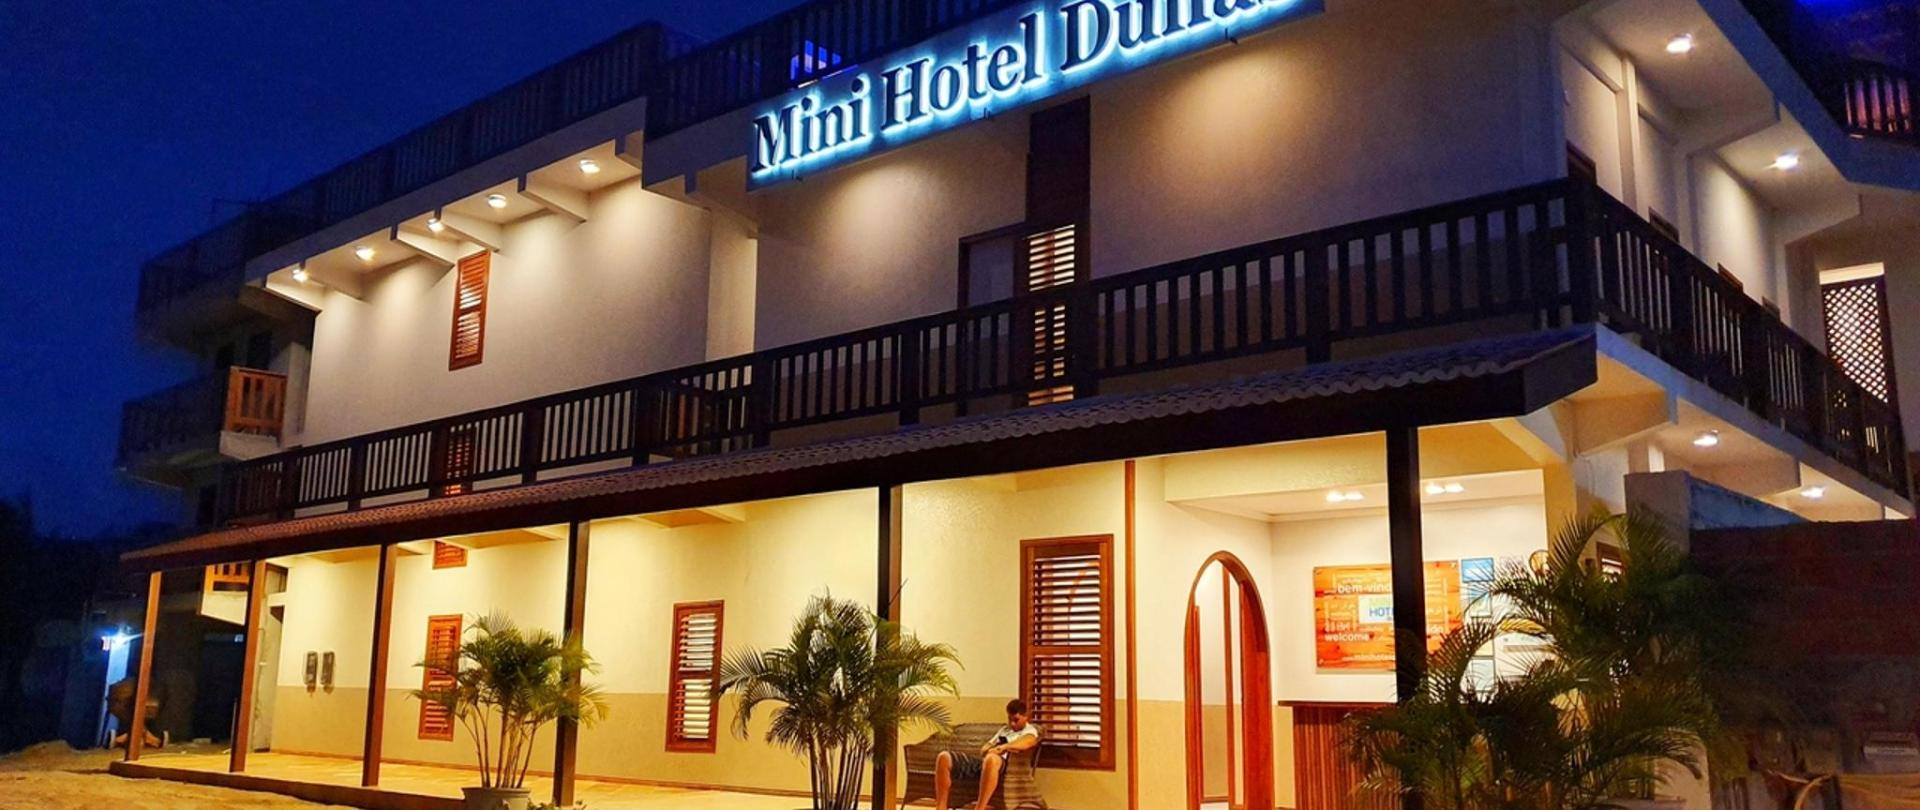 Mini Hotel Dunas